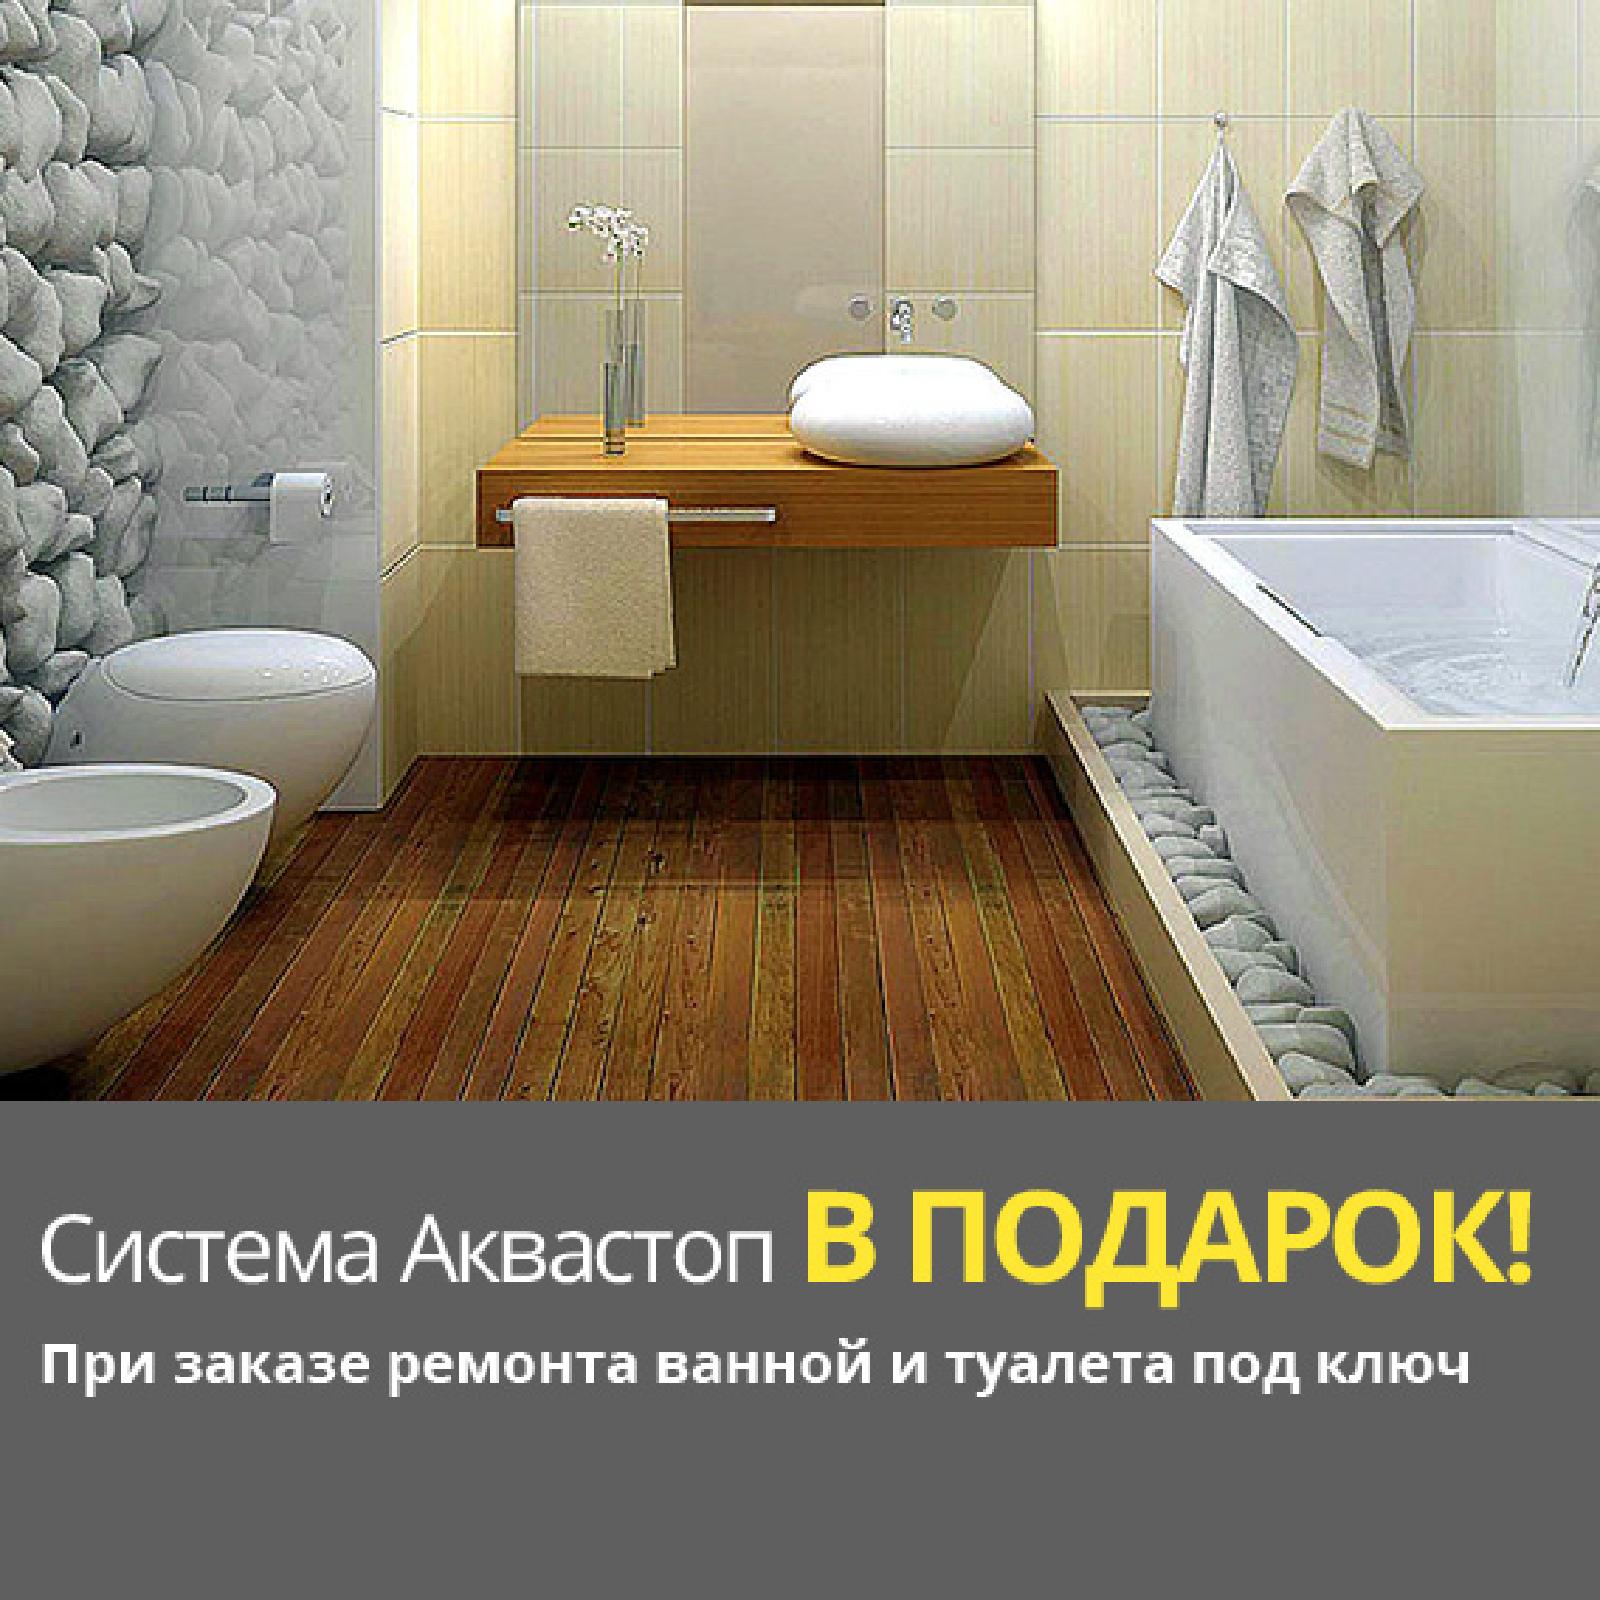 Система Аквастоп в подарок при заказе ремонта ванной и туалета под ключ!